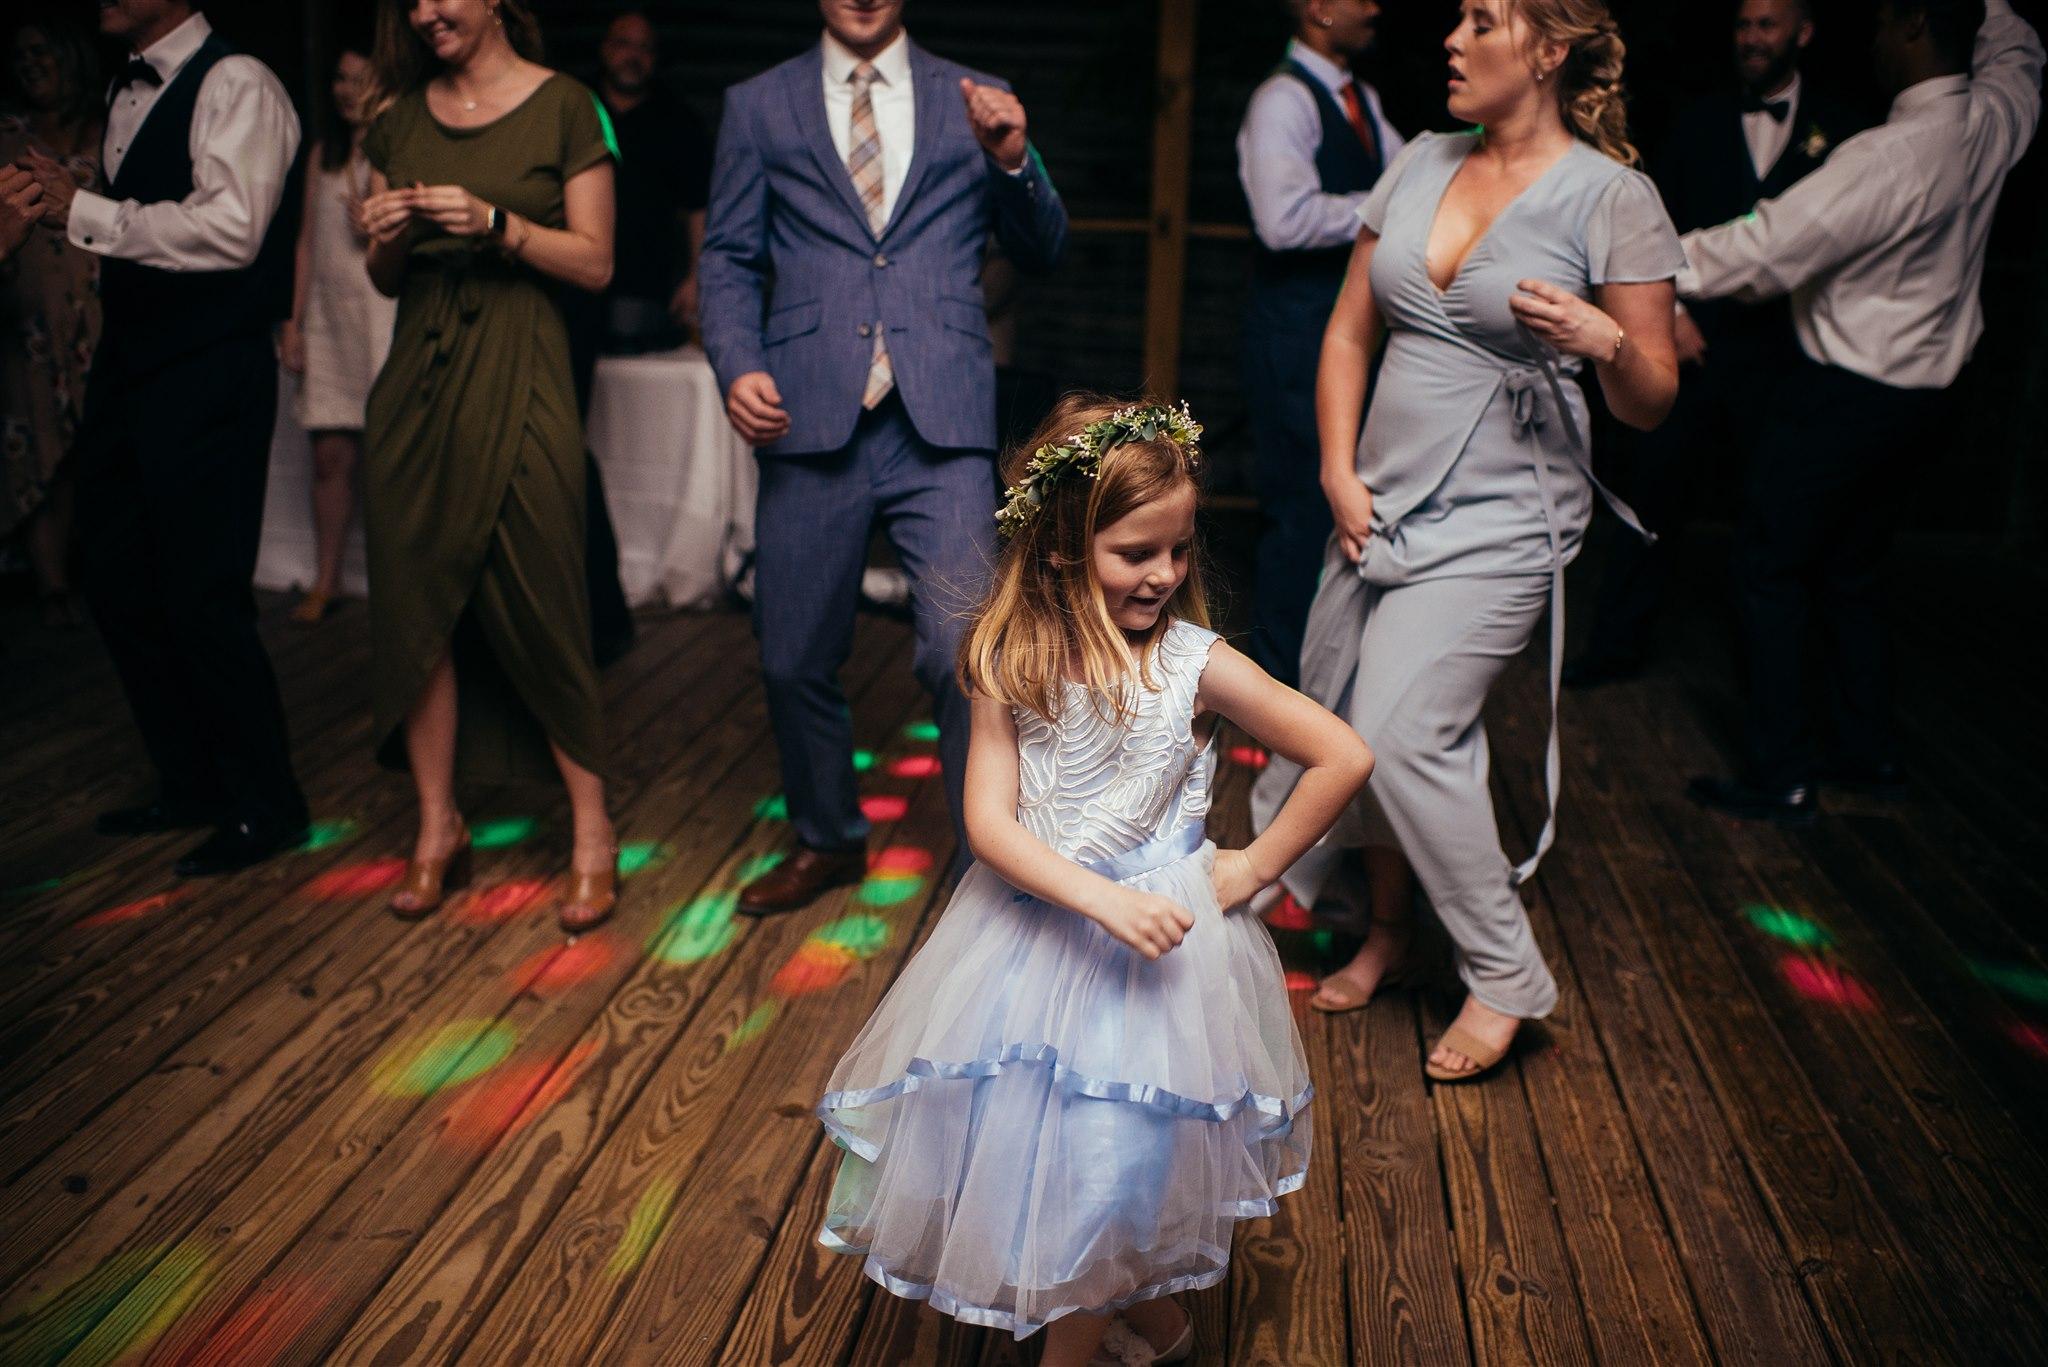 Shannon _ Tim -7863.jpgCedar Grove Acres Wedding - Raleigh Wedding Photographer - North Carolina Wedding Photographer - Creedmoor Wedding Photographer - Summer Wedding